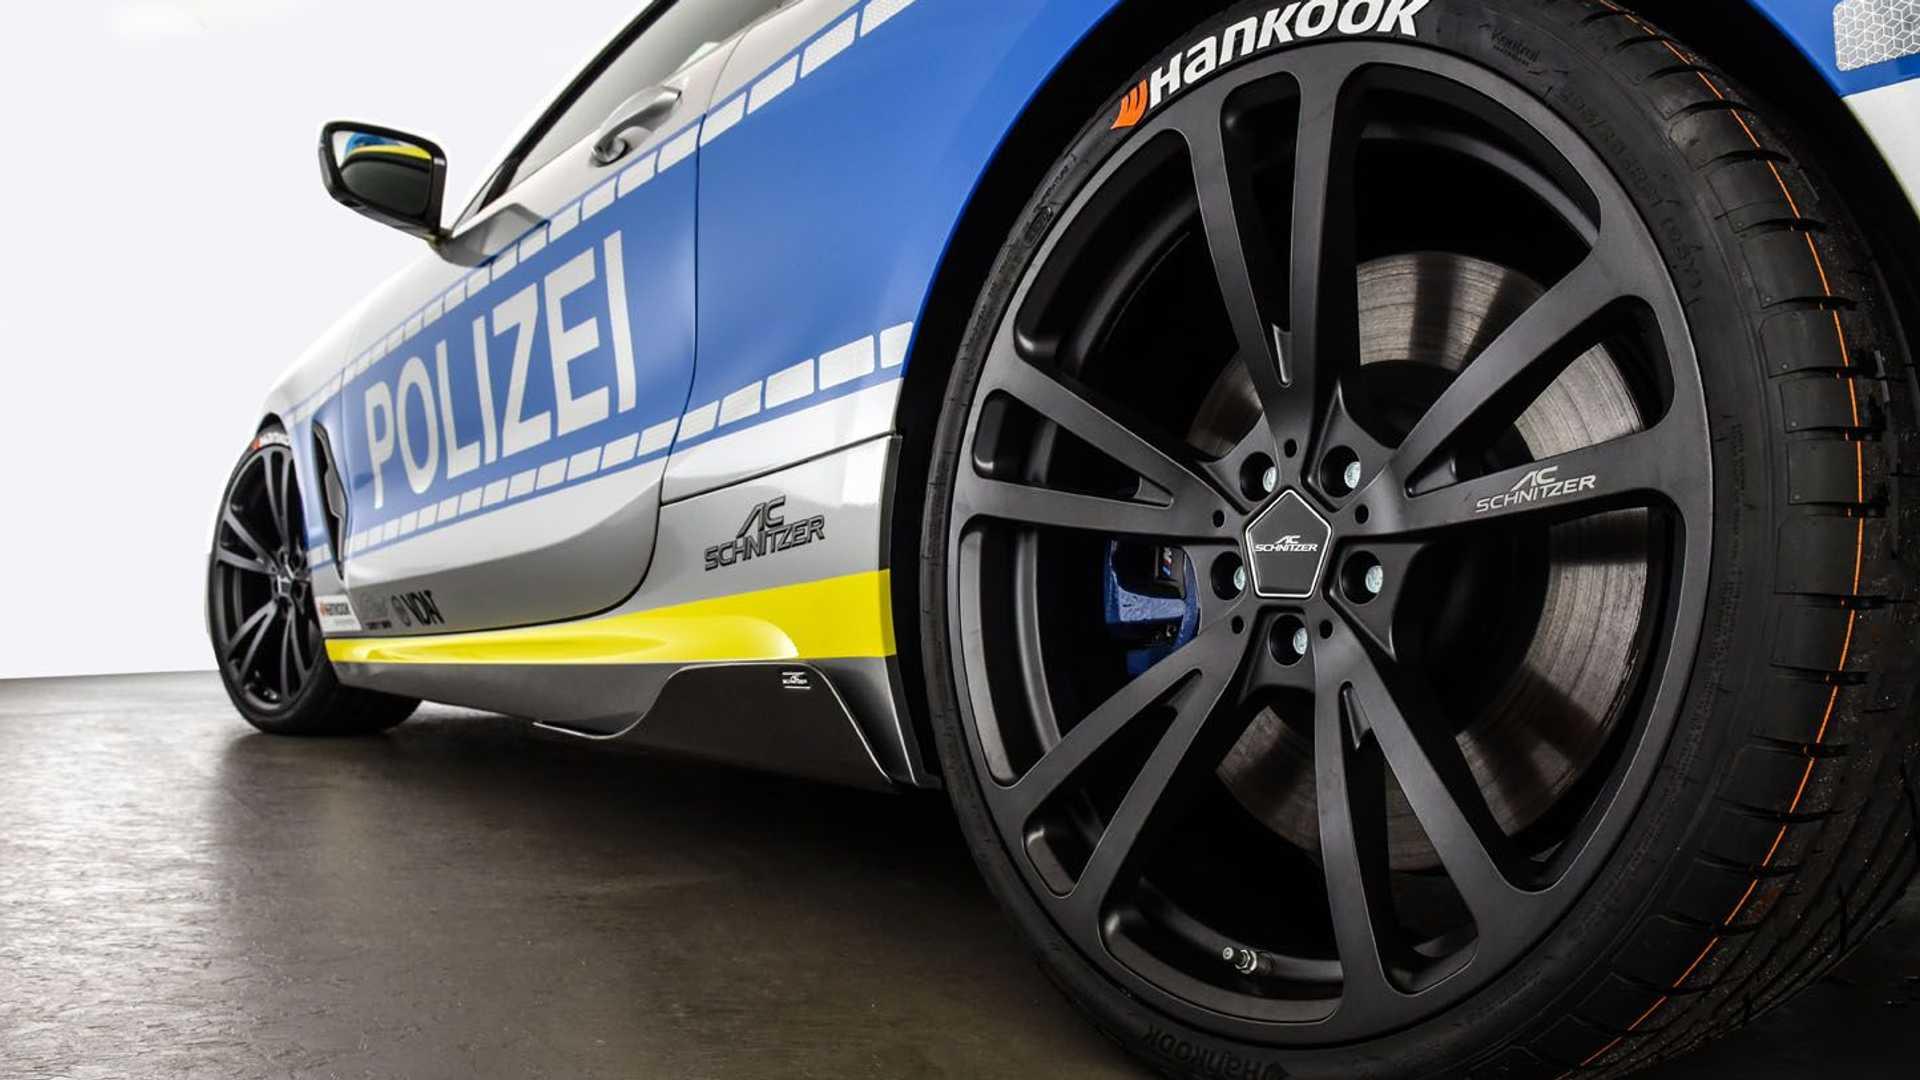 BMW-M850i-police-car-tune-it-safe-37